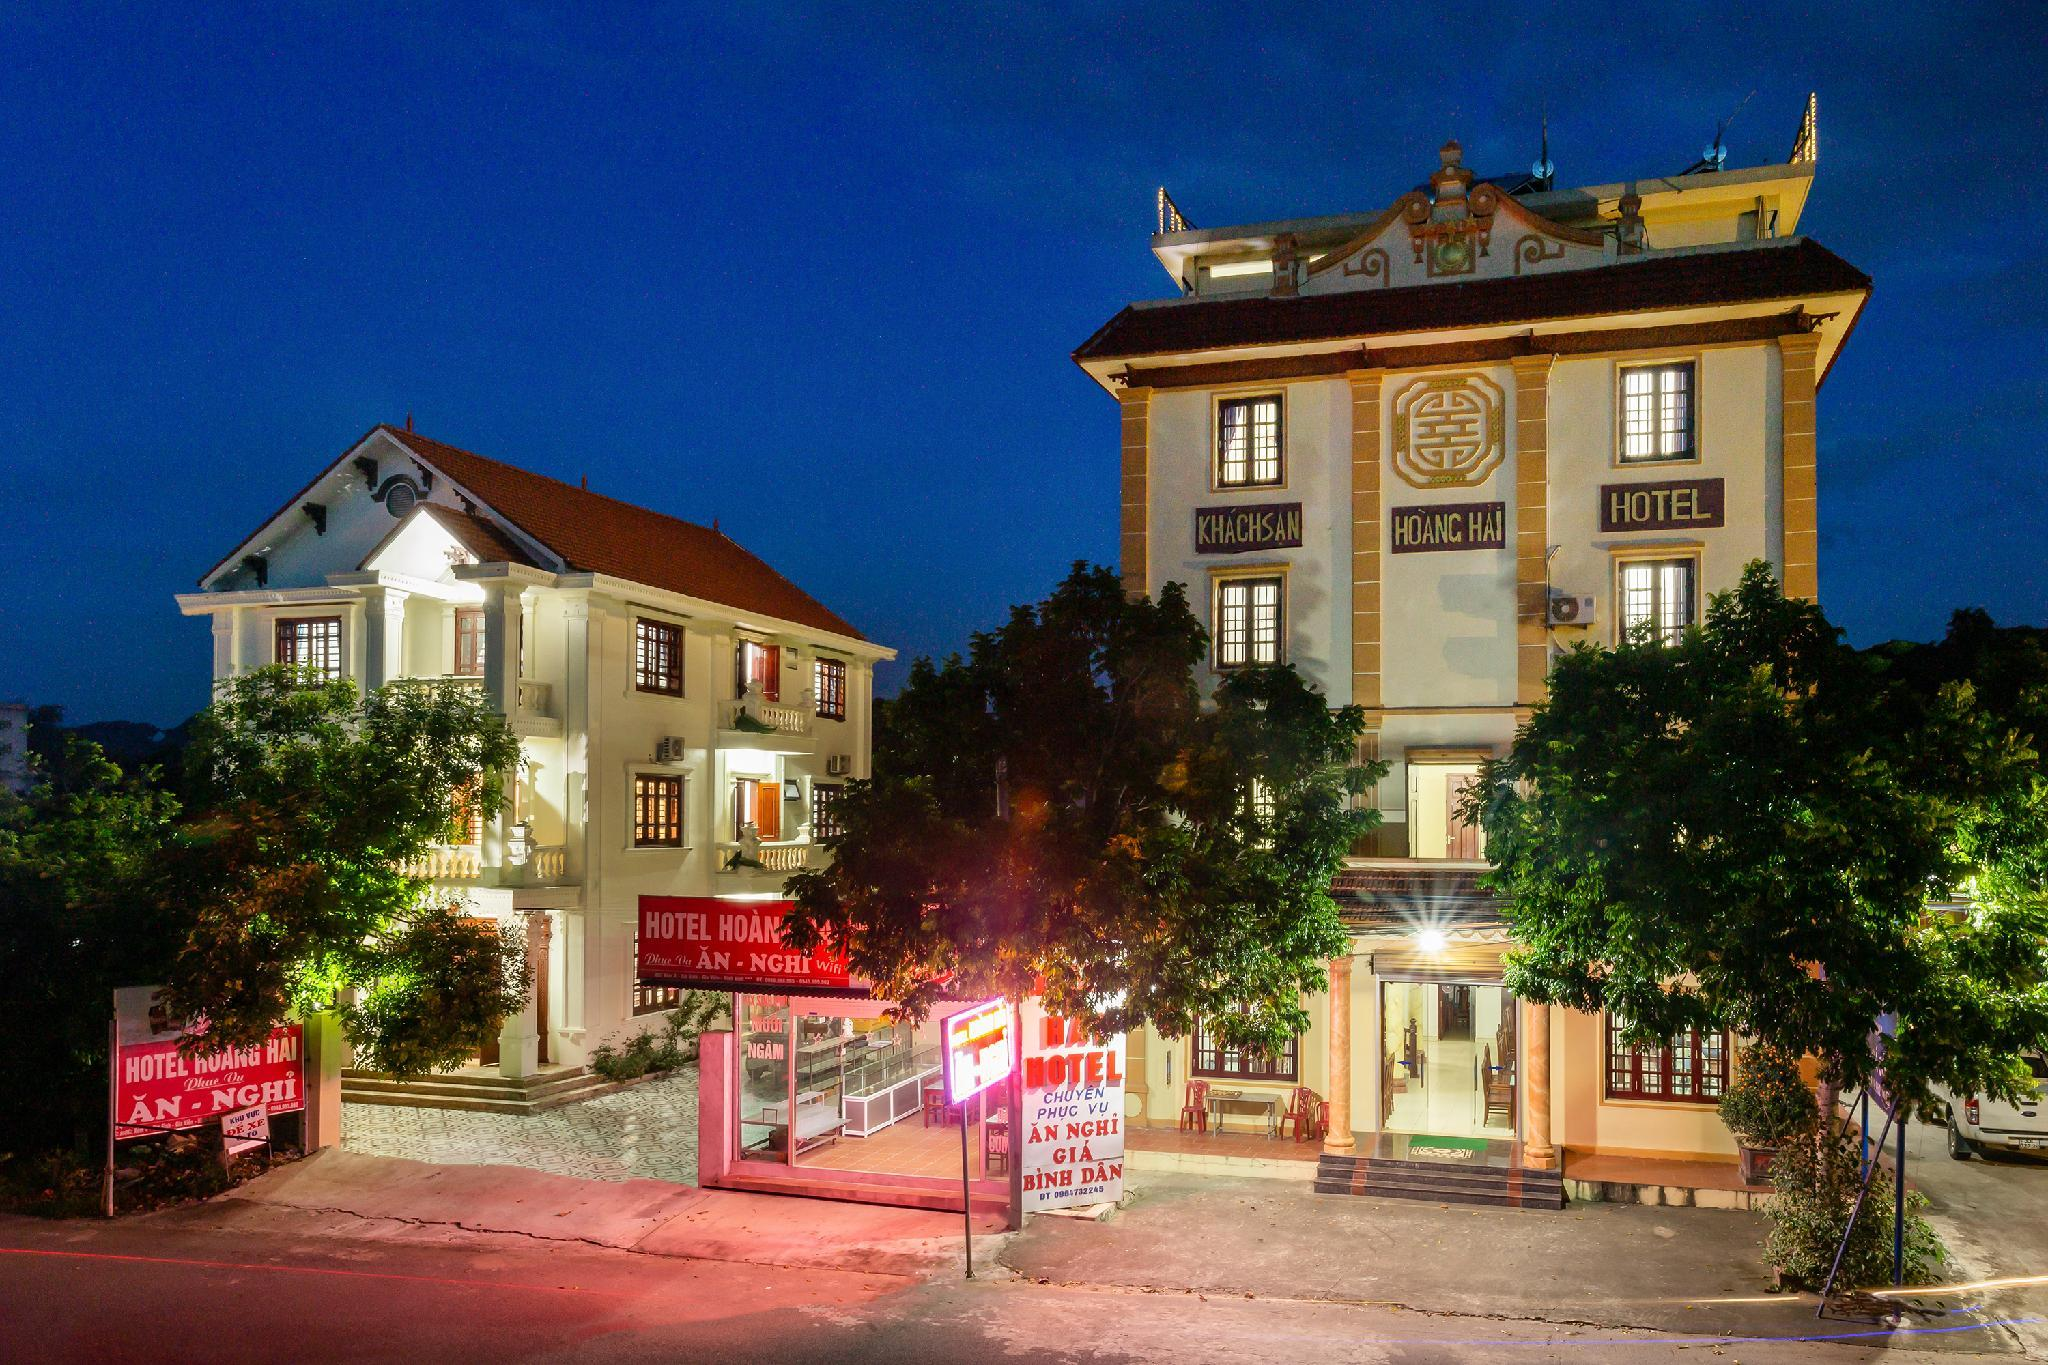 Trang An Family Hotel